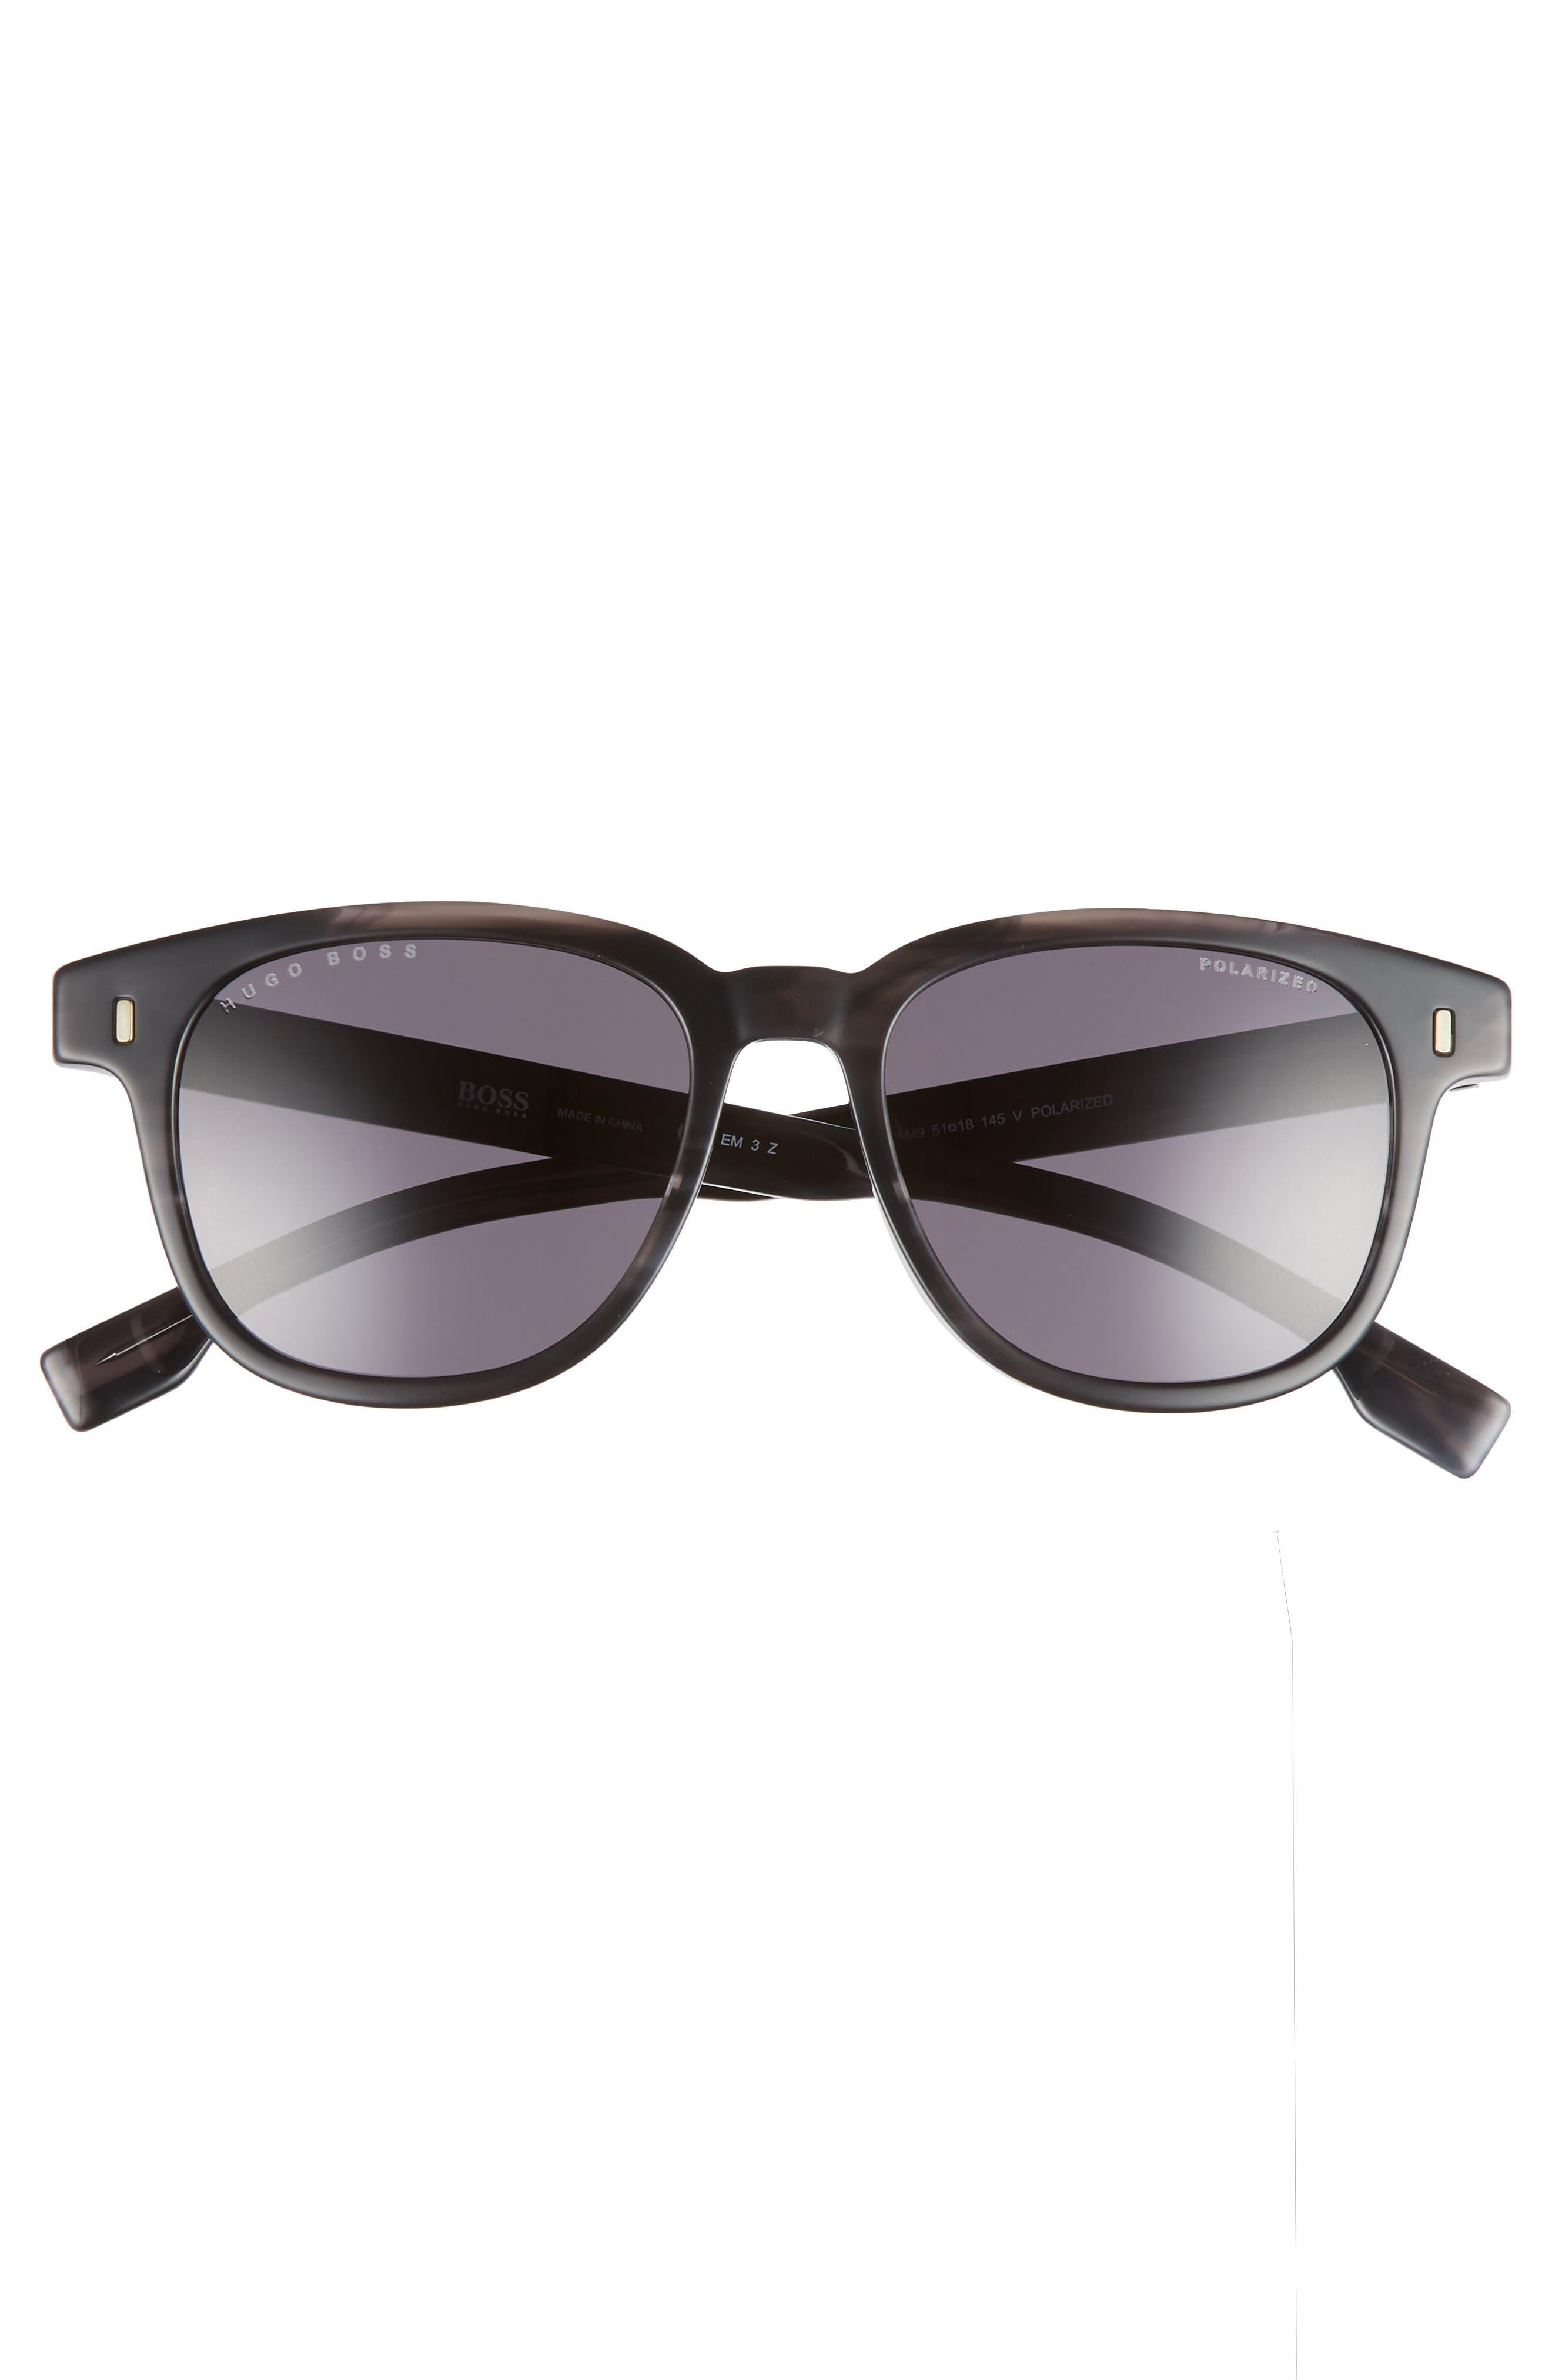 1408cde1df5 men s sunglasses